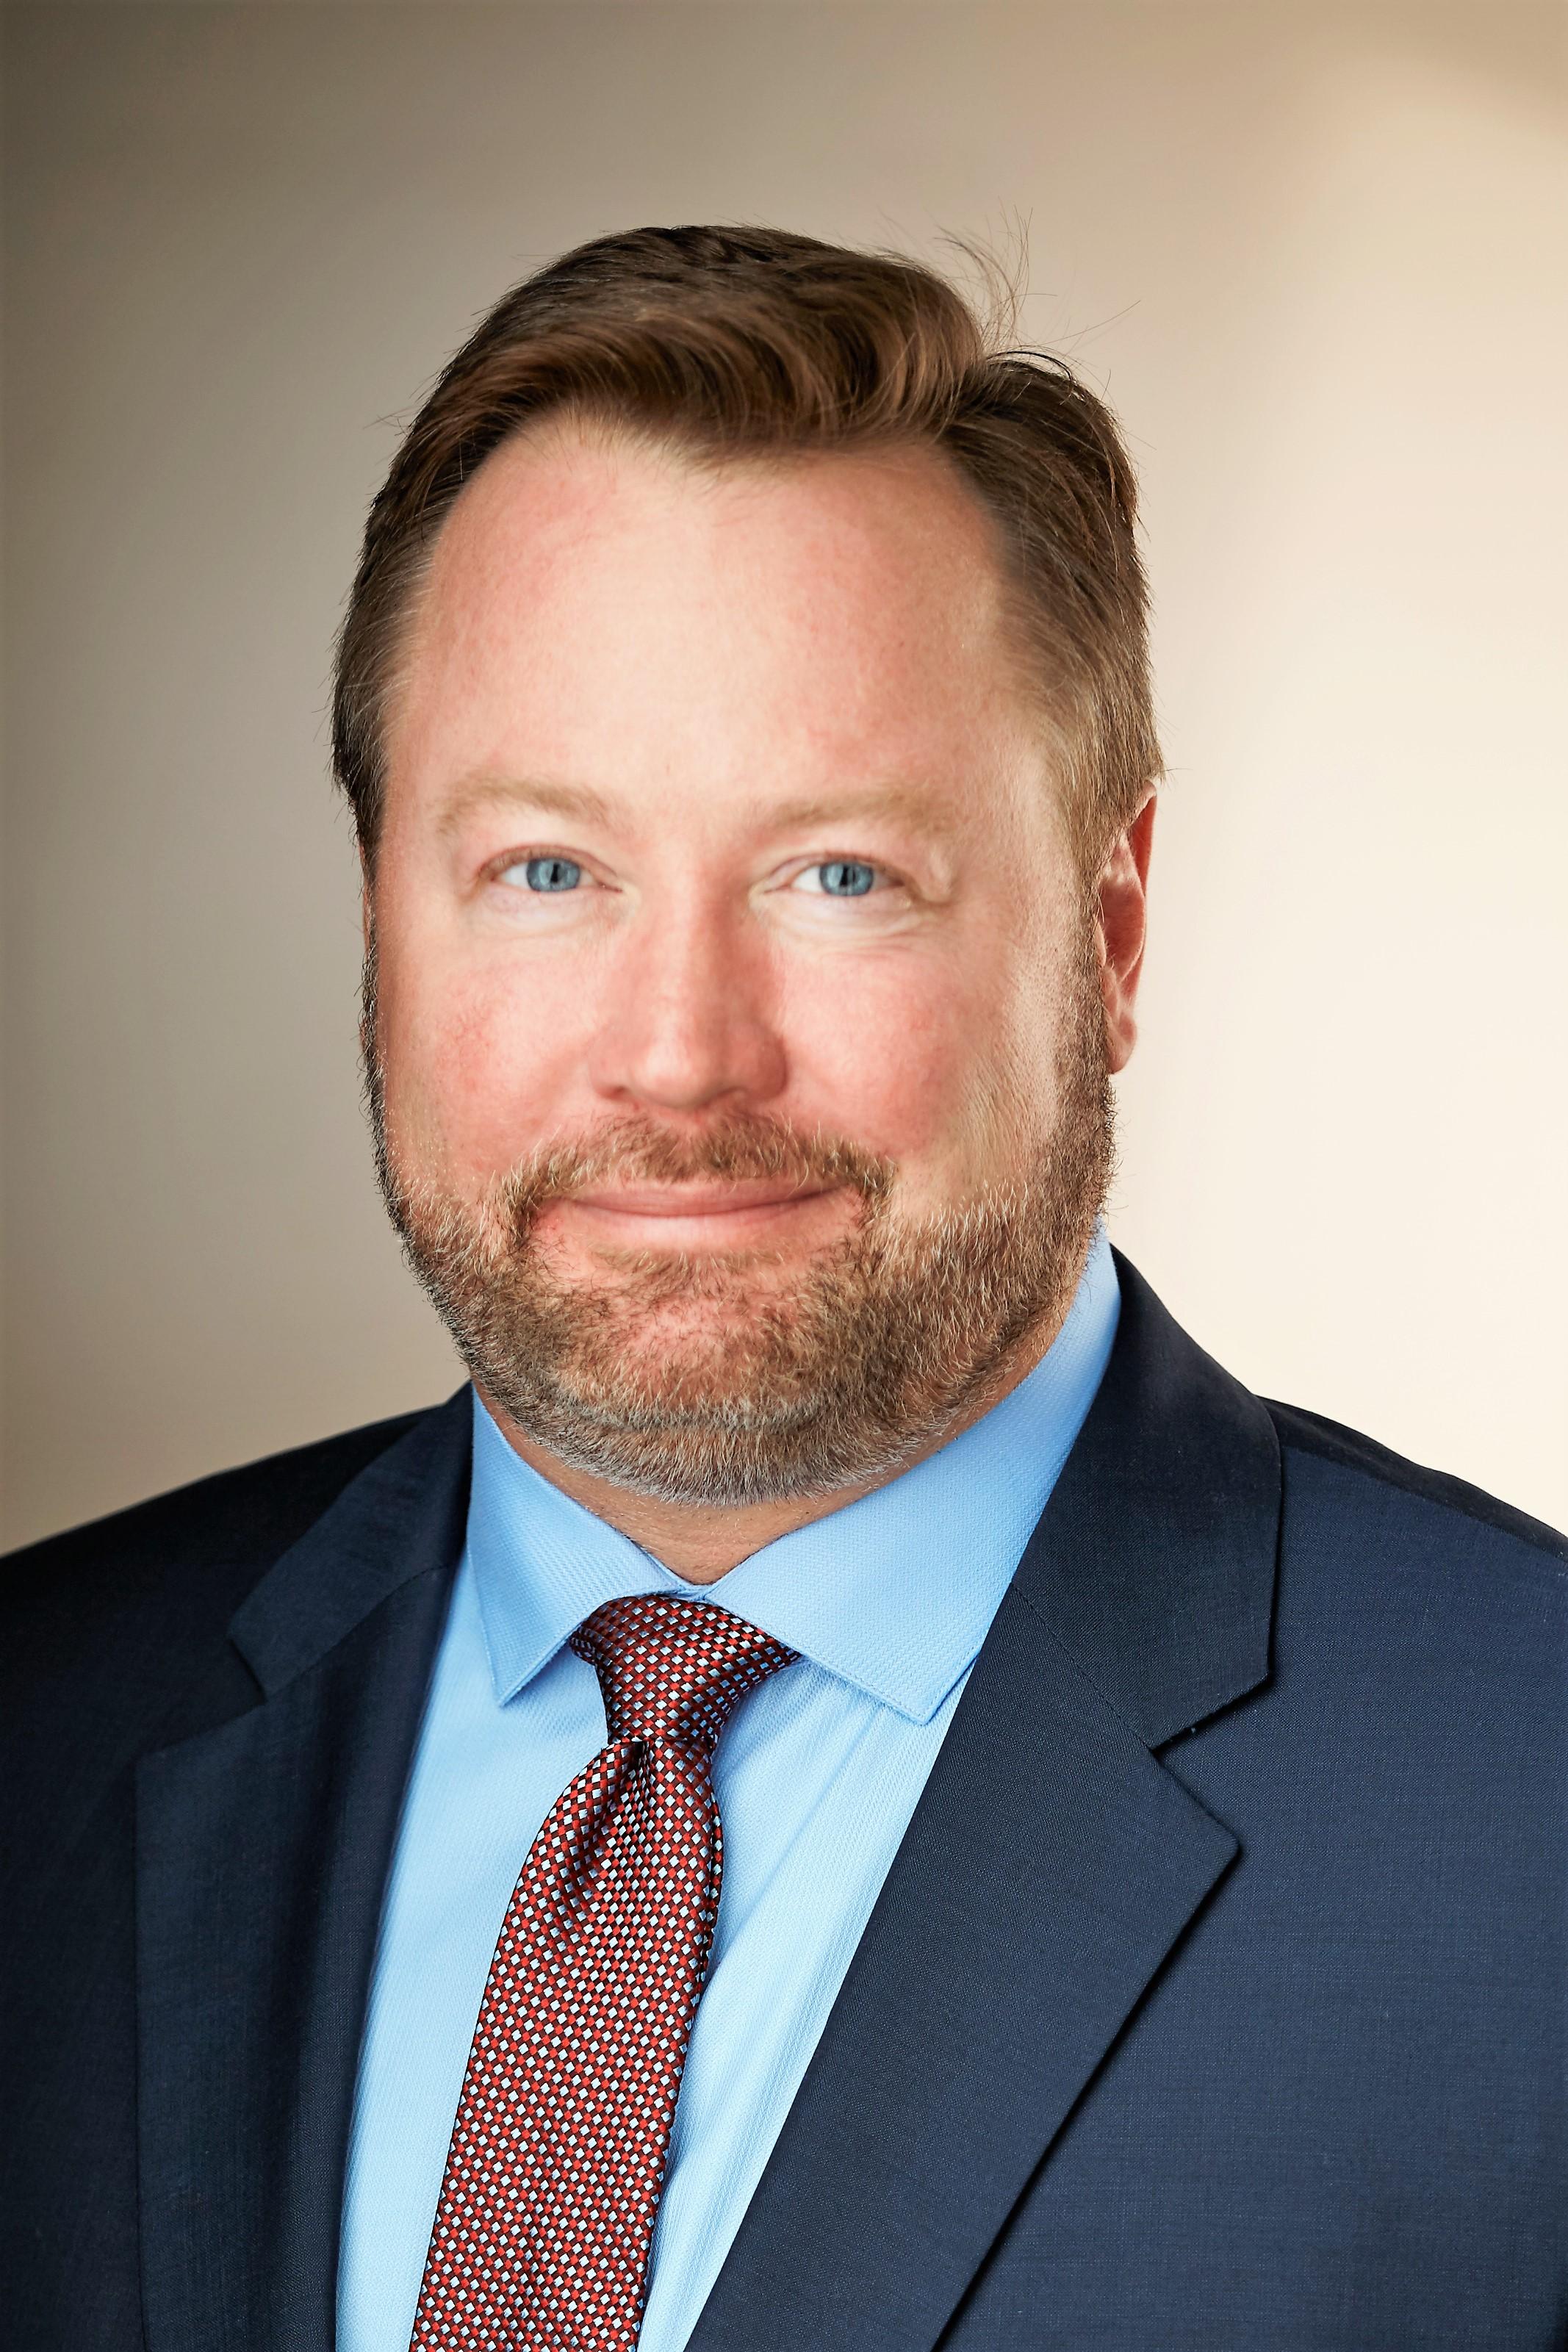 Andrew Barrett, CEO